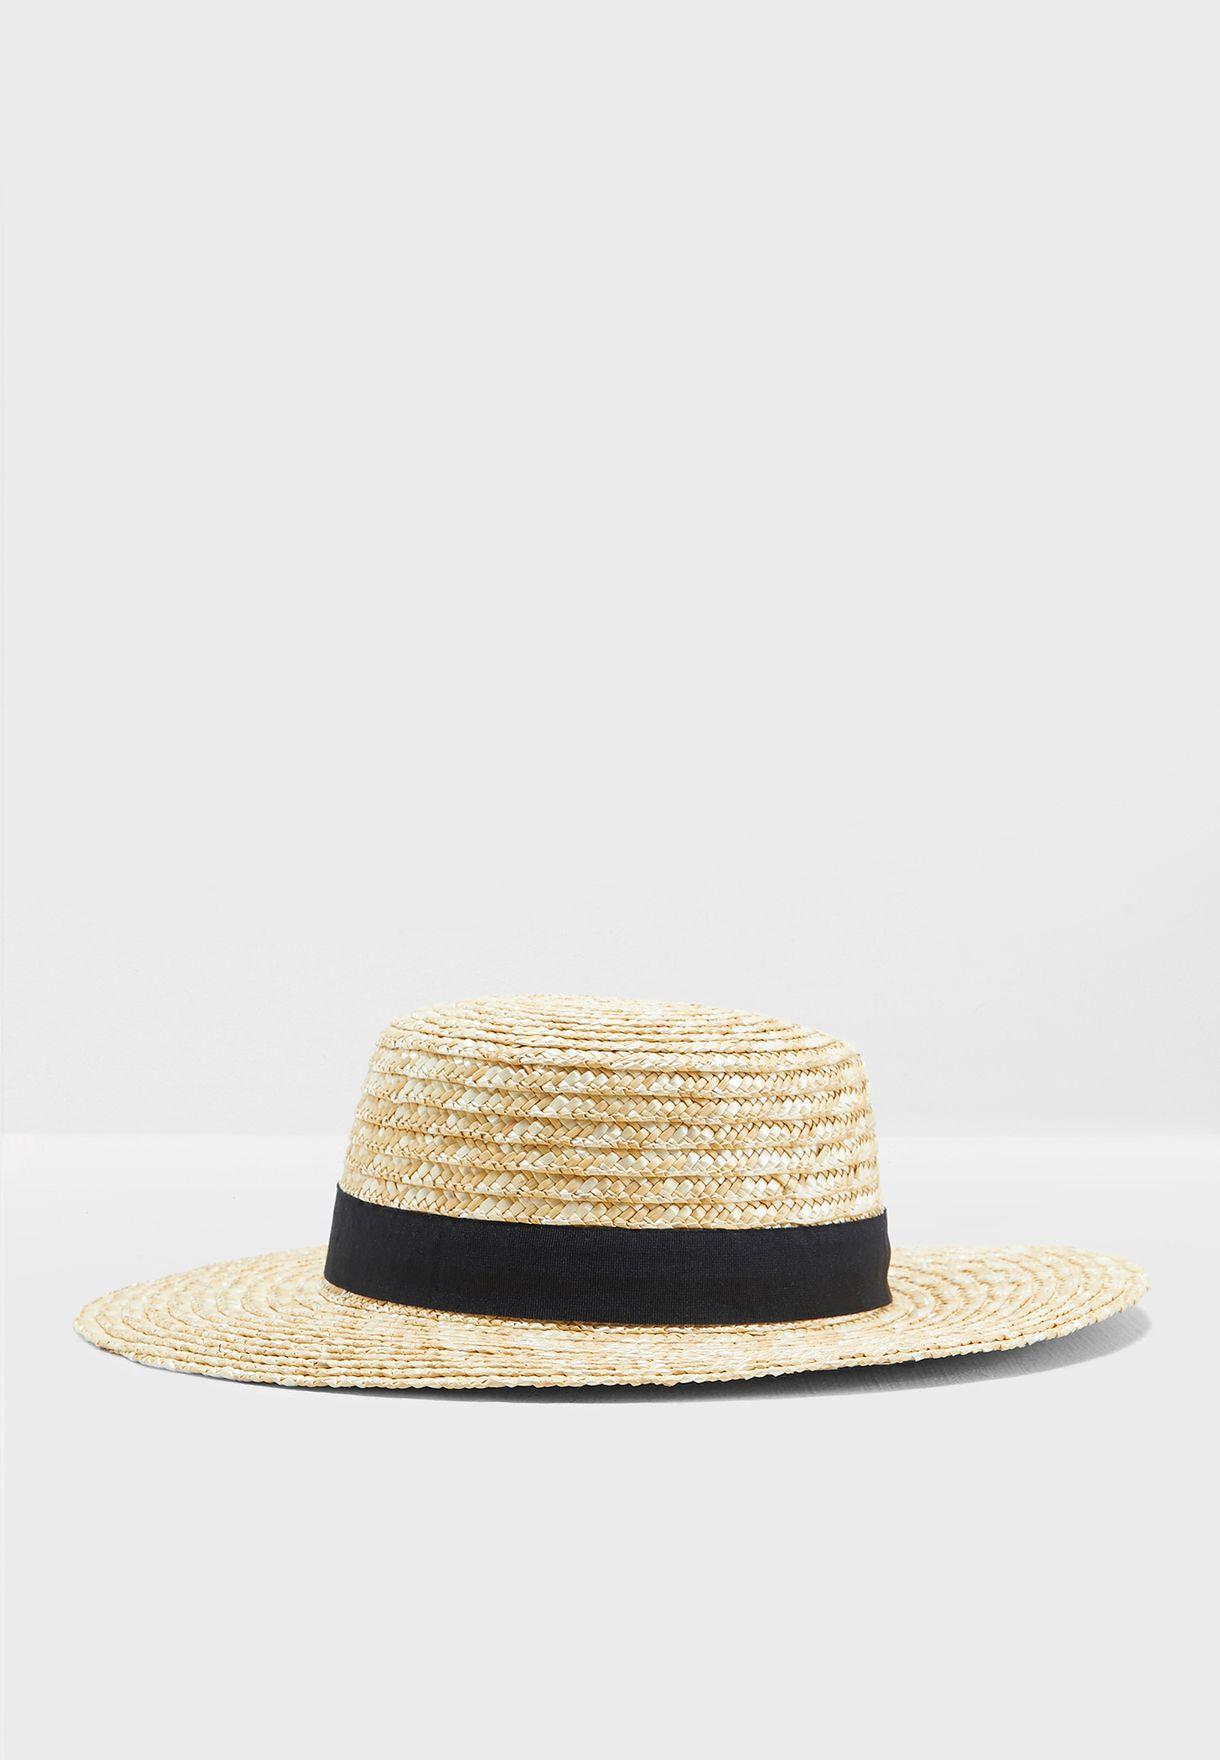 7bfaf17f97620 Shop Forever 21 beige Straw Hat 336886 for Women in Qatar - 20008AC08SSP